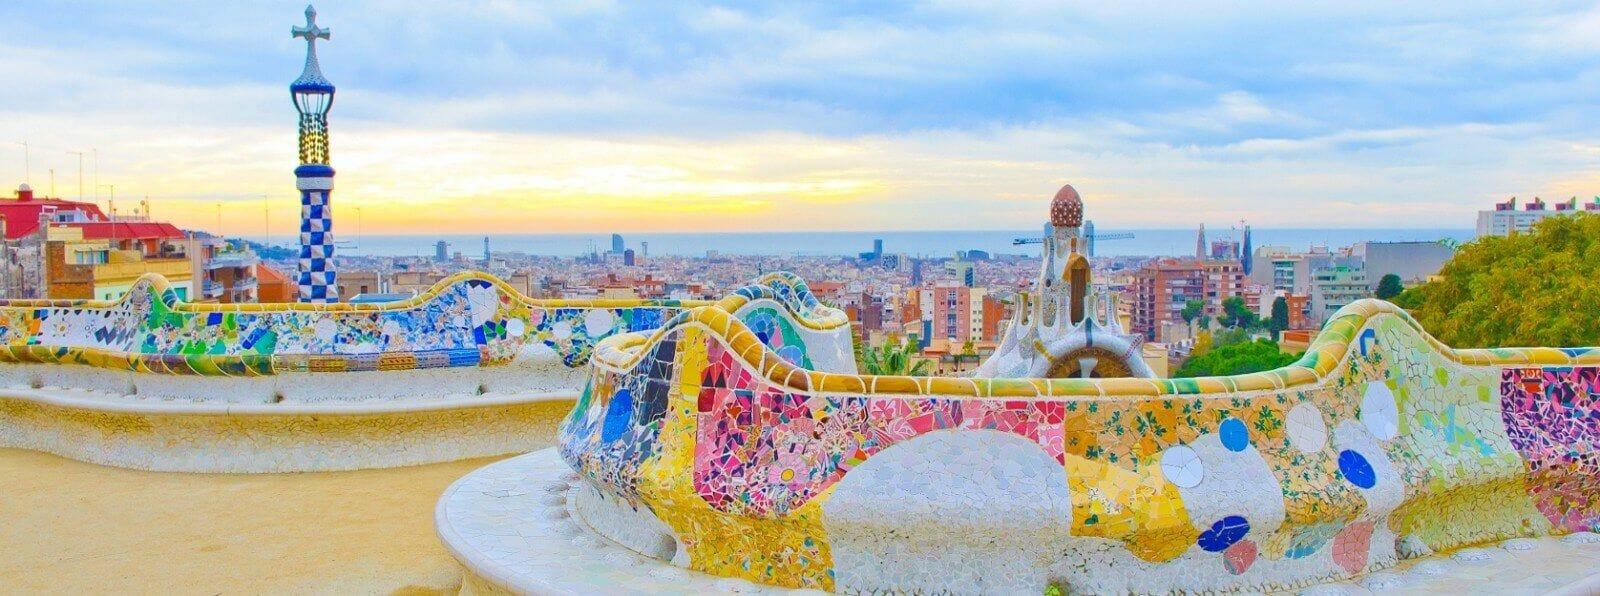 panoramica de barcelona gaudi parque güell